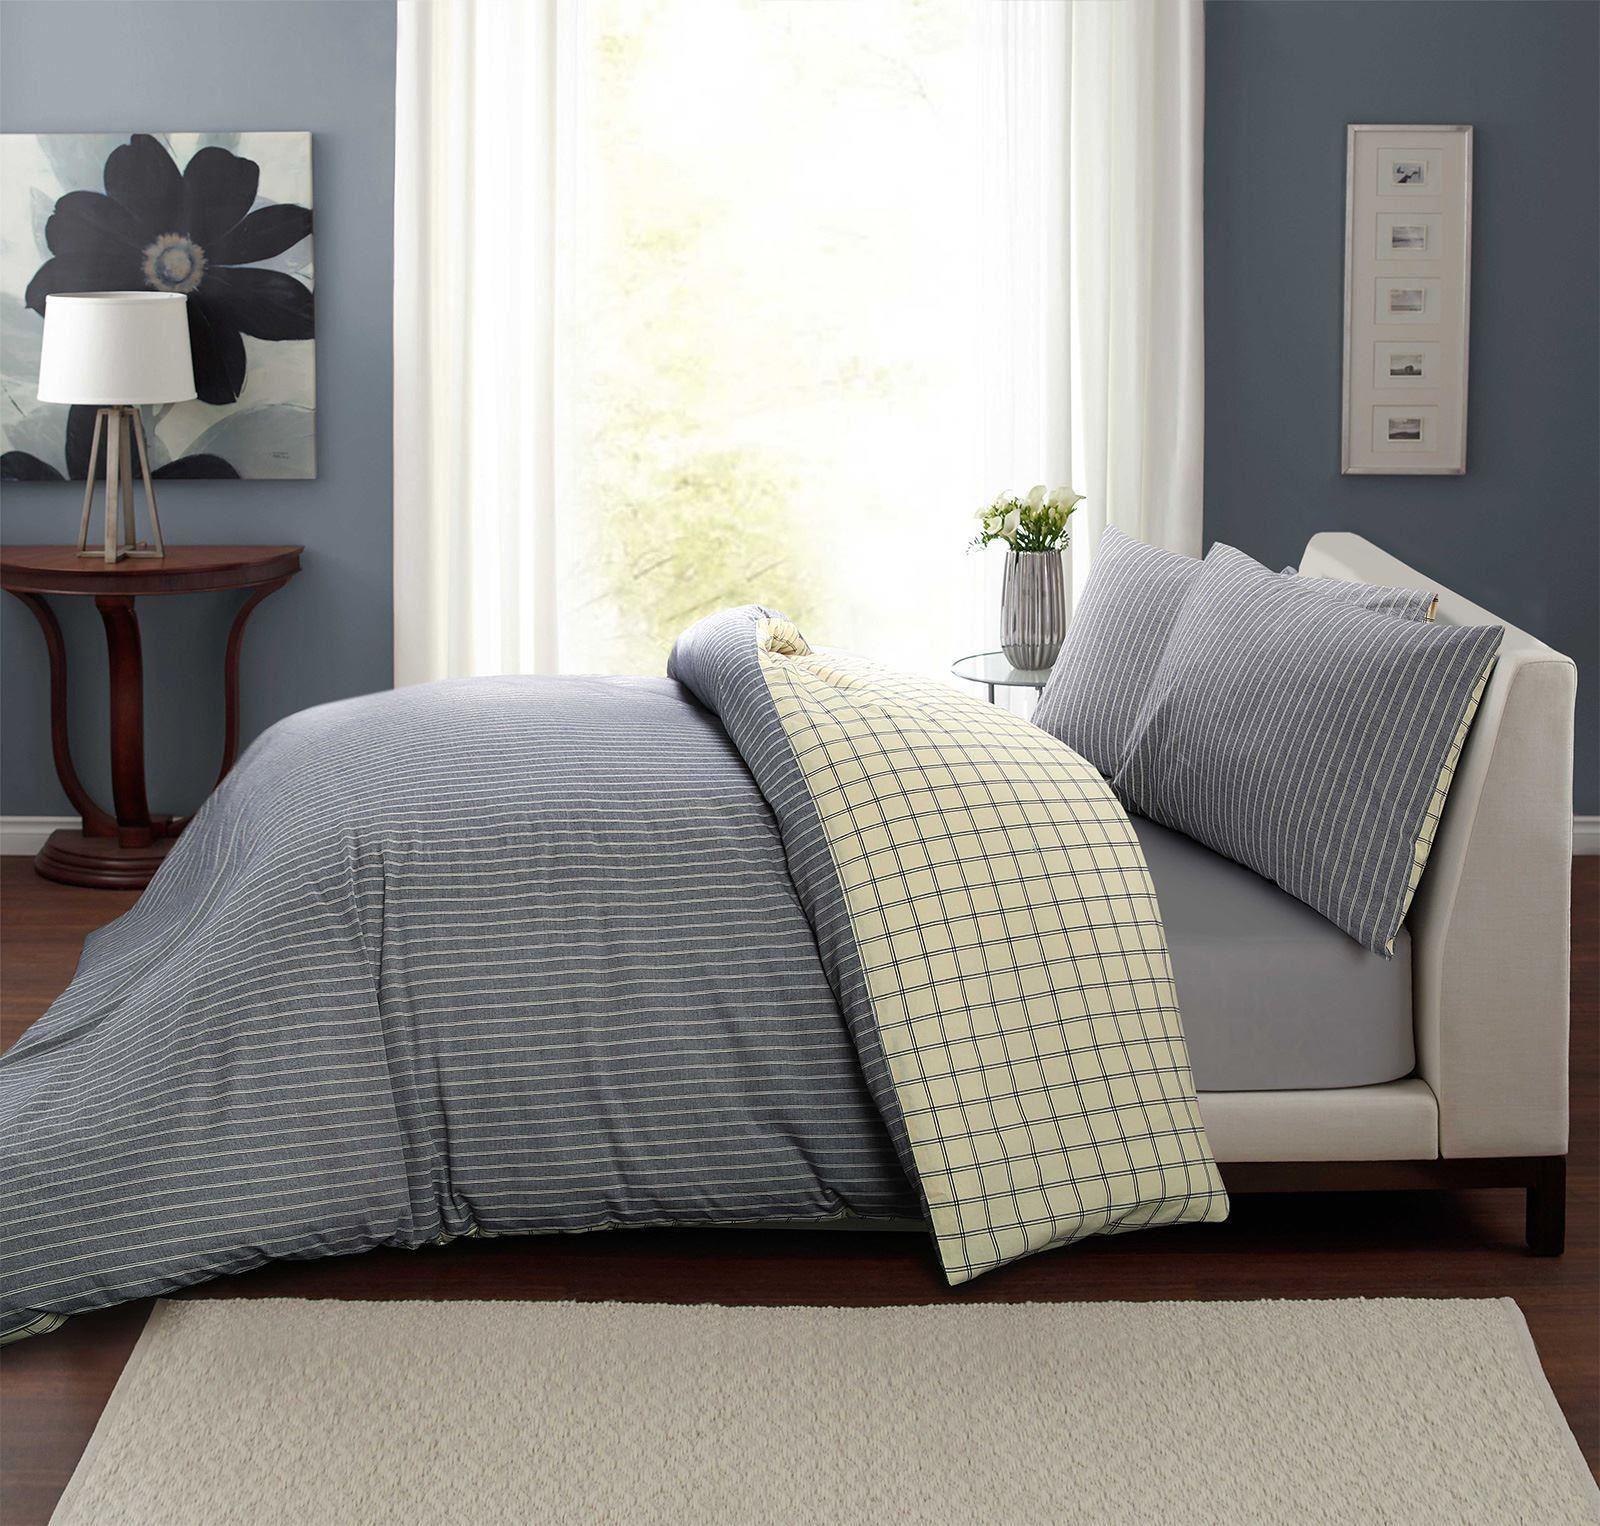 100-algodon-duvet-cover-set-raya-Cuadros-Reversible-Ropa-De-Cama-Individual-Doble-King miniatura 11